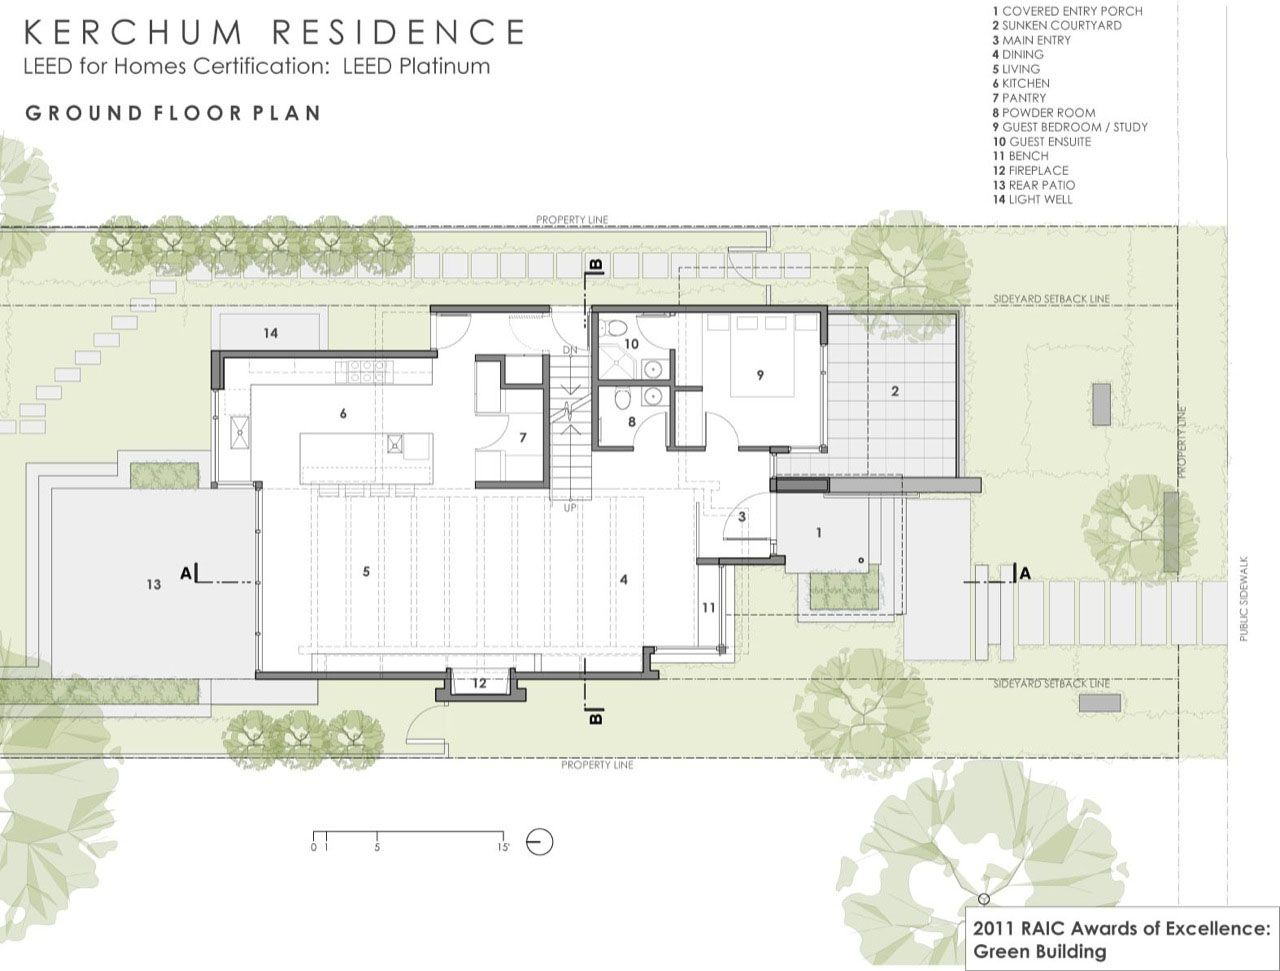 Sustainable-Home-Design-Dunbar_13 | Design - Architecture & Interior ...